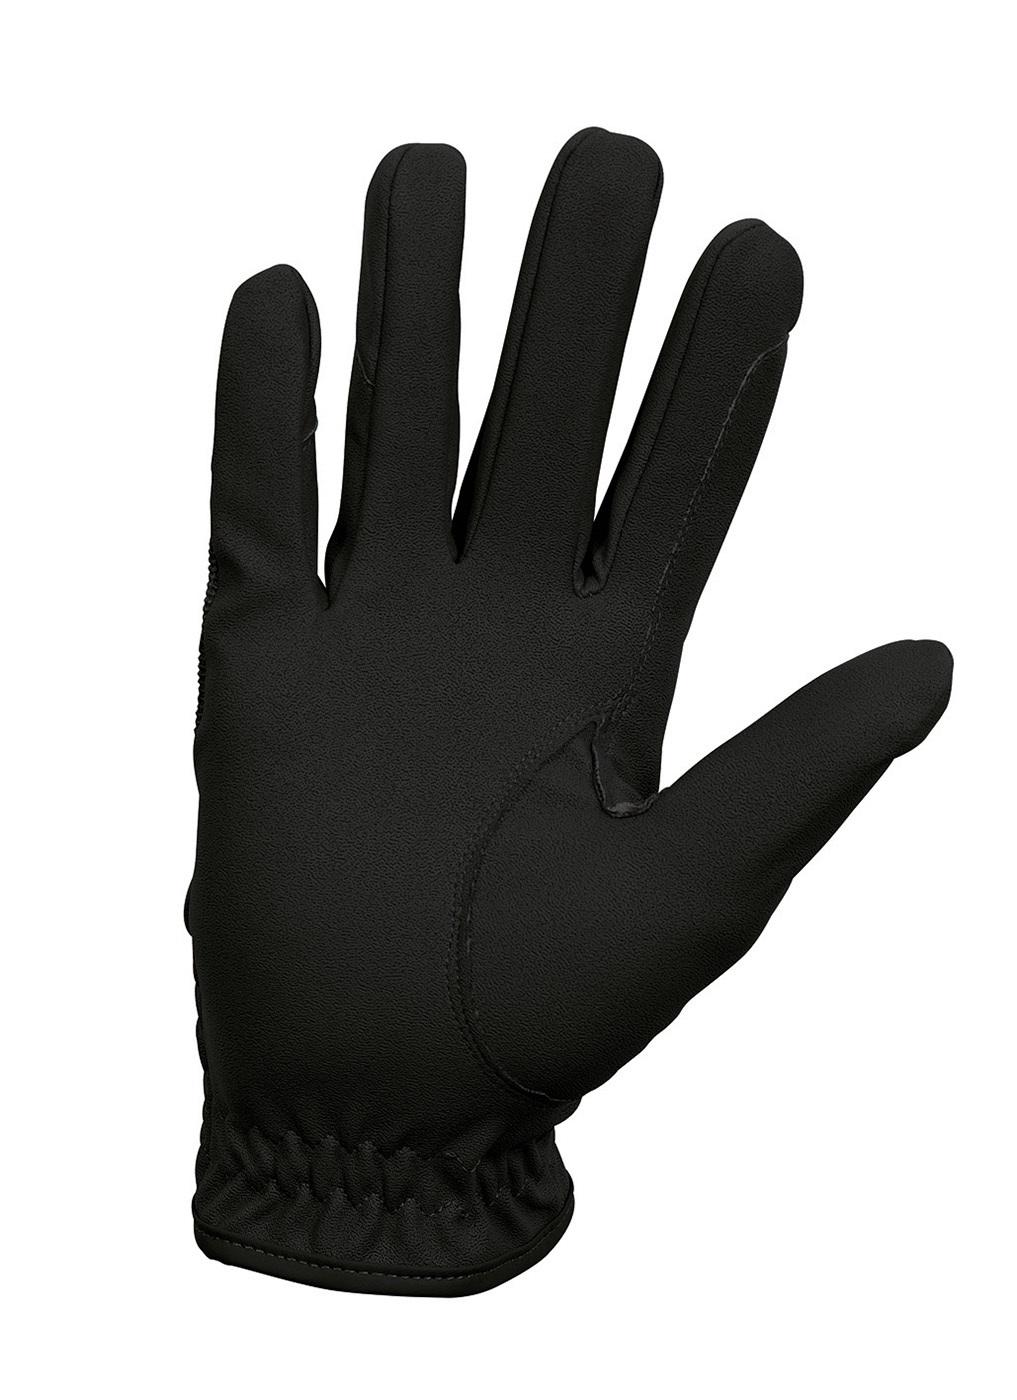 REITHANDSCHUHE •anti-slip Hightech-Leder WEISS schwarz GRAU angenehm elastisch